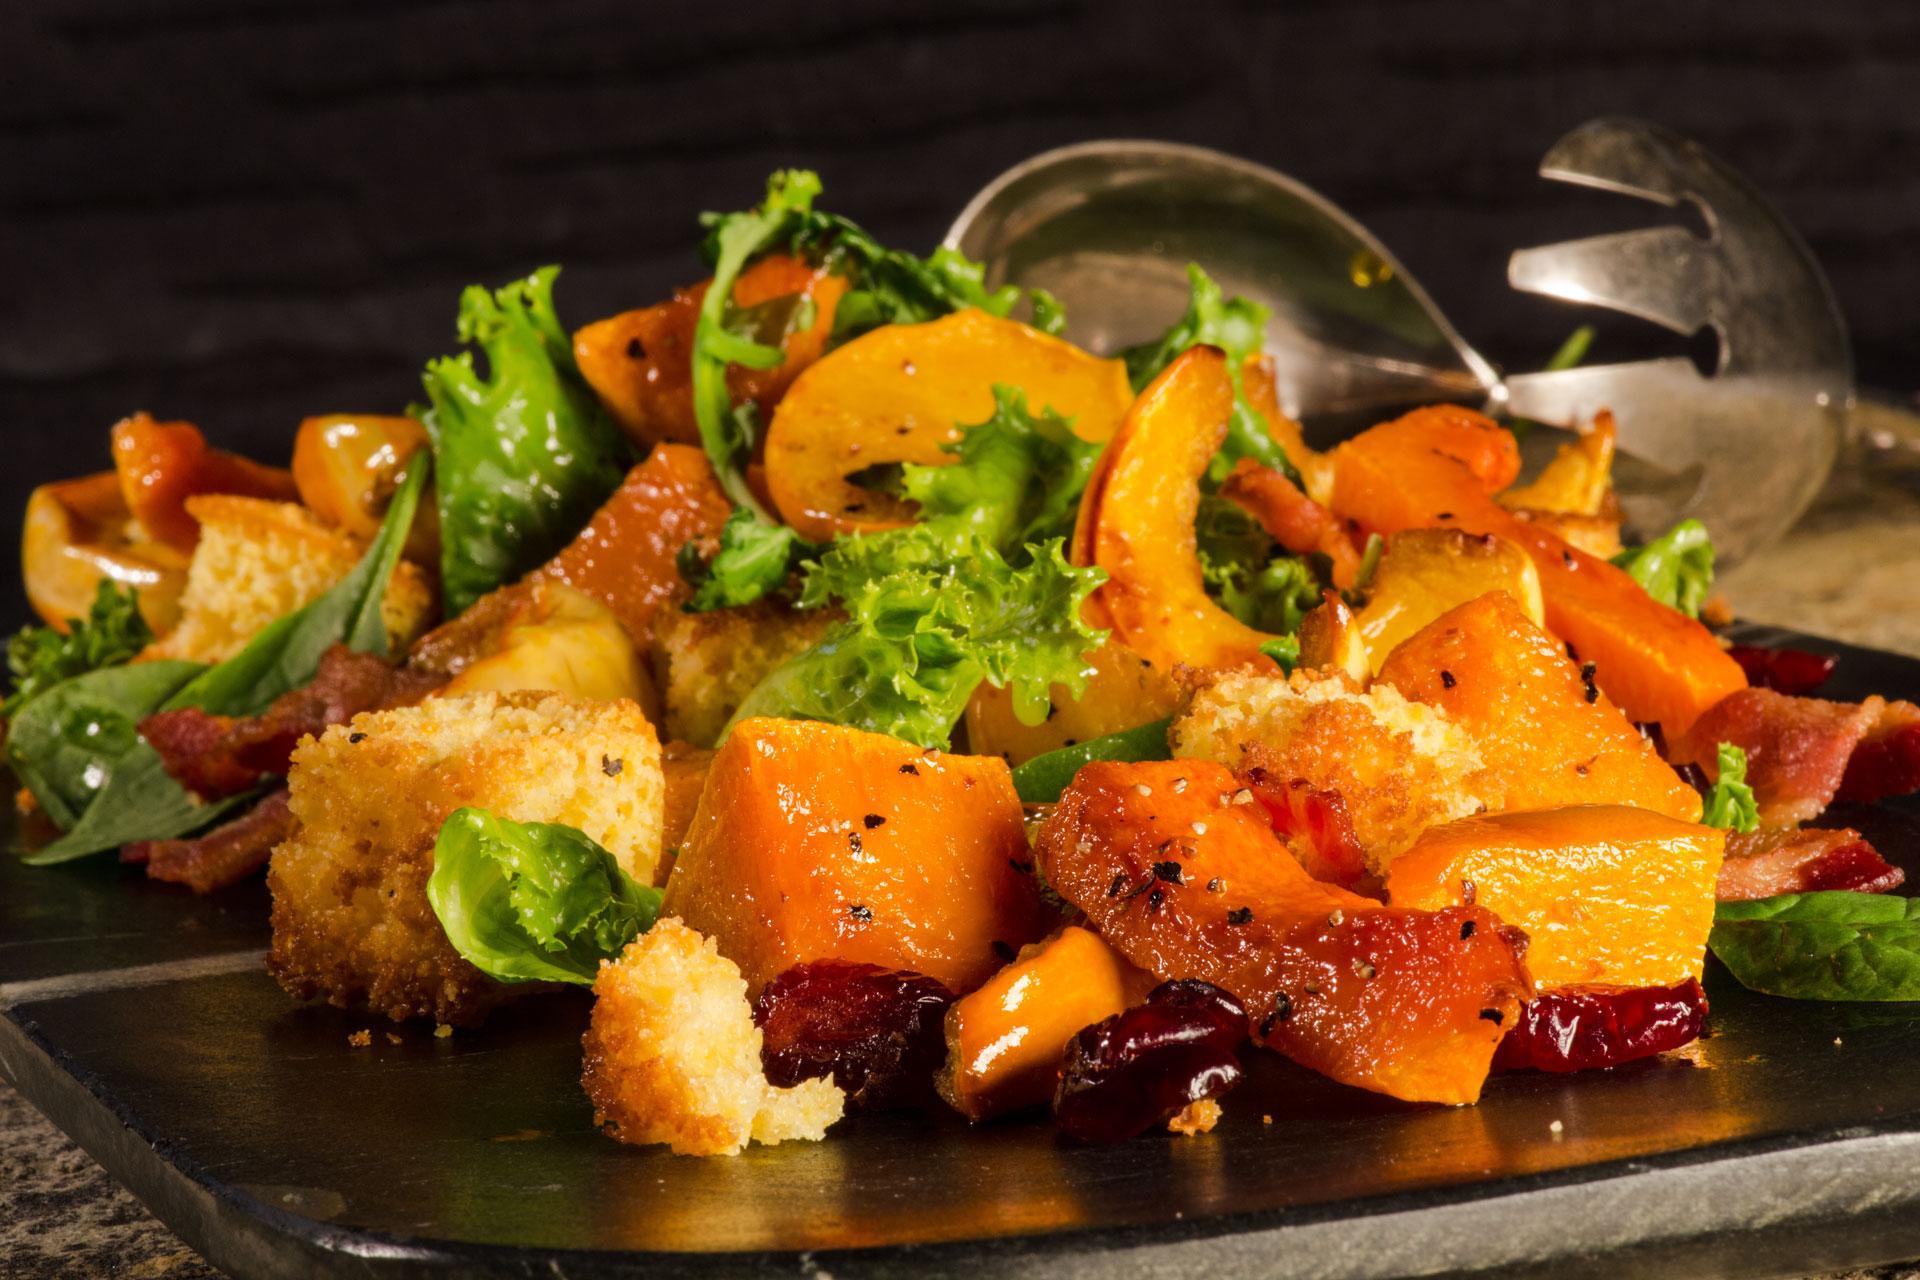 Panzanella Salad with Roasted Butternut Squash and Maple Dijon Vinaigrette